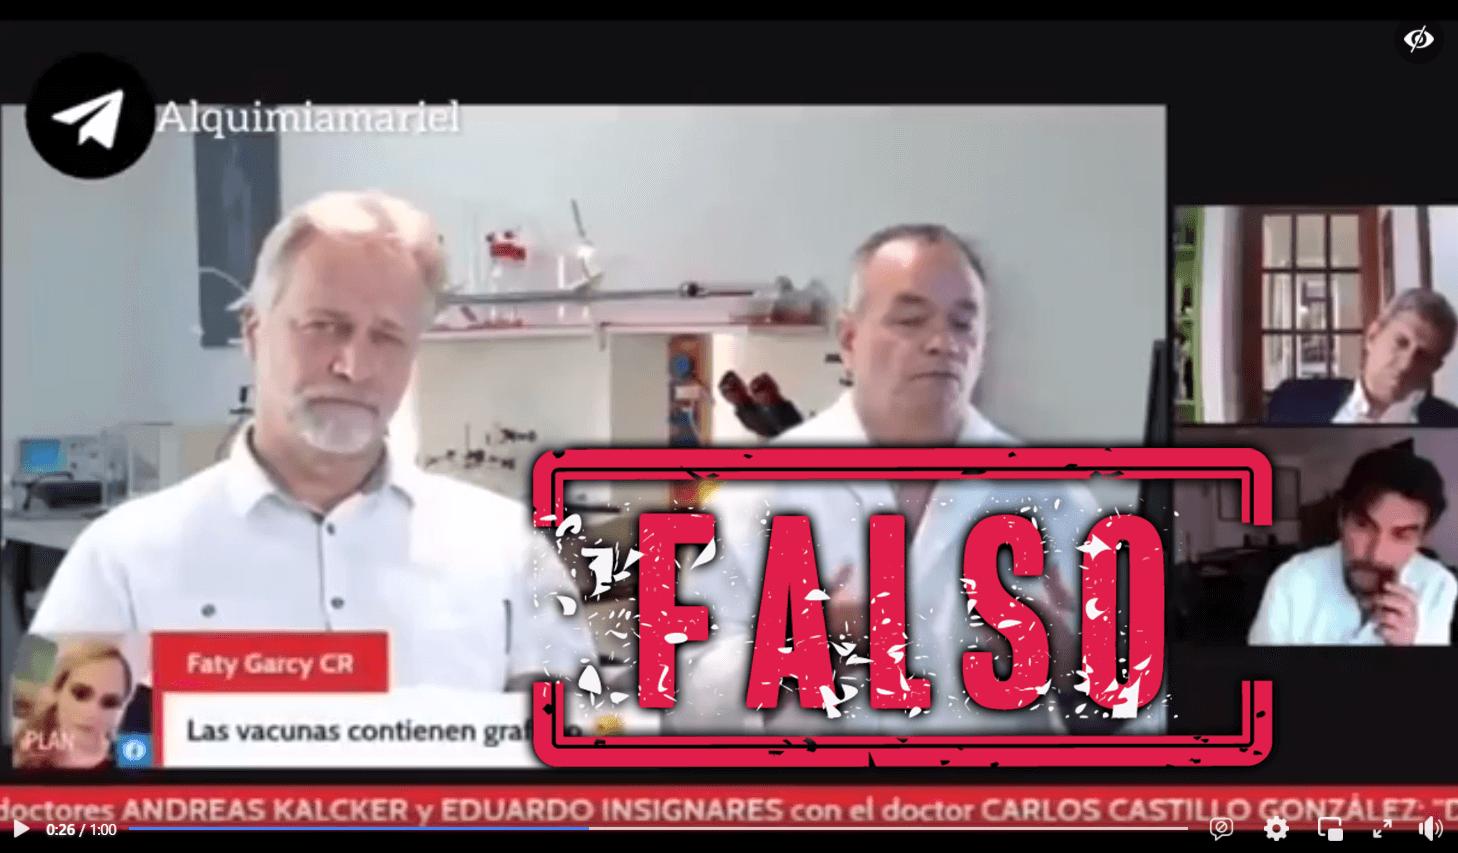 Etiqueta falso pantallazo